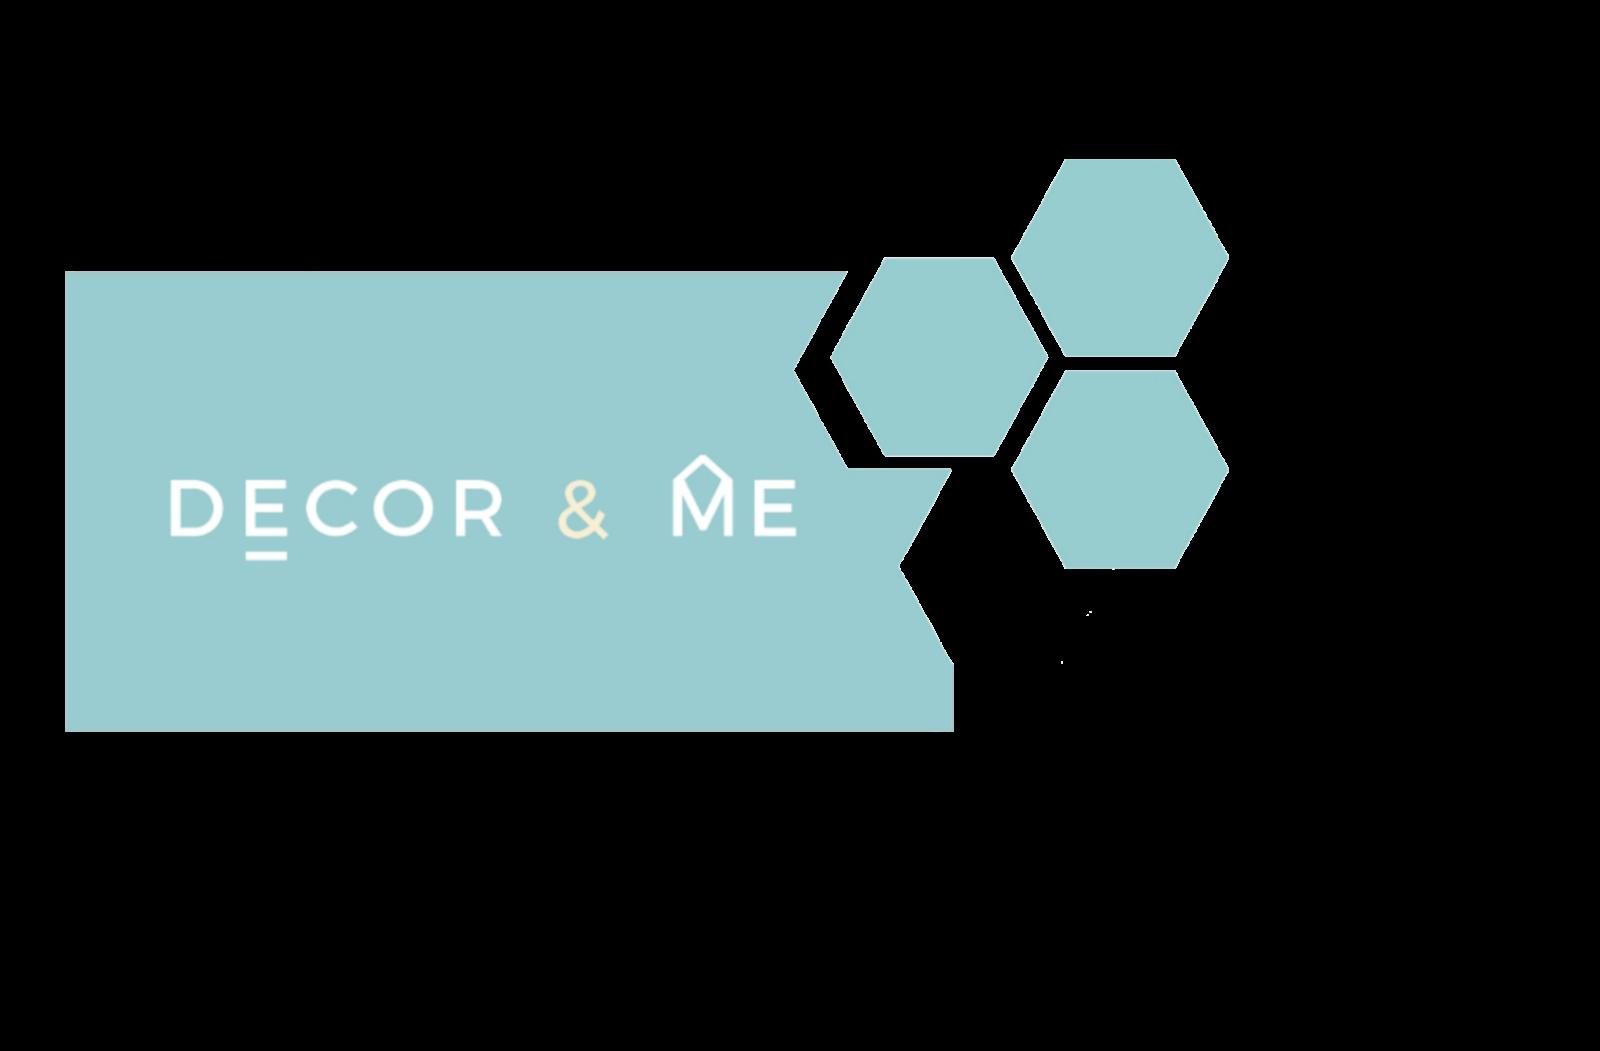 Decor&Me